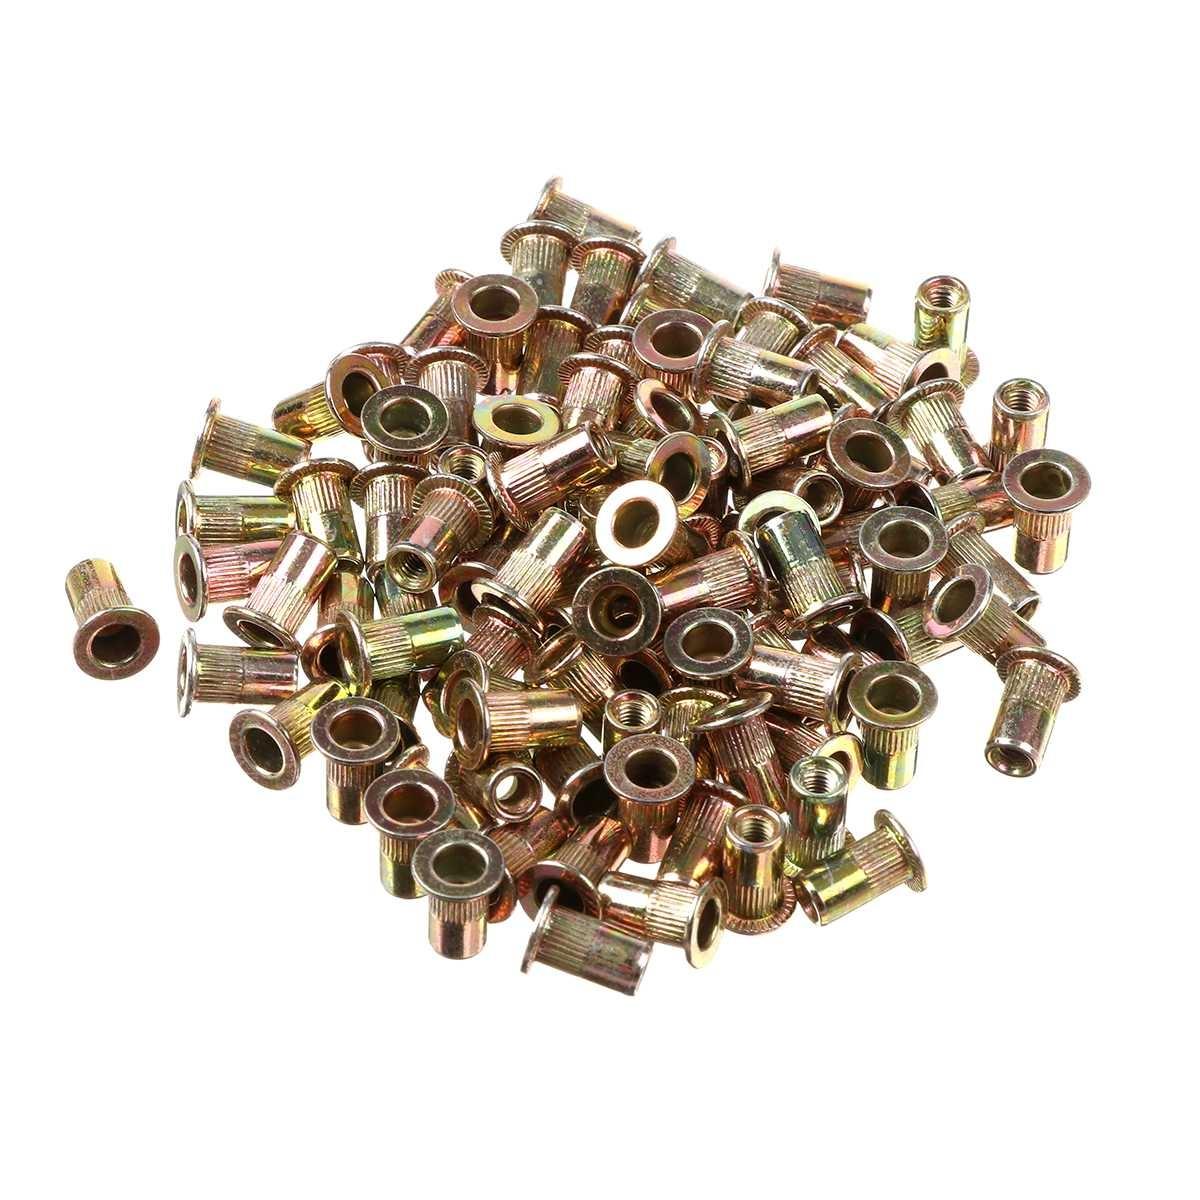 100/165/300 PCS Carbon Steel Zinc Plated Rivet Nuts Flat Head Threaded Rivet Insert Nutsert Rivet Nut Assortment Kit M3 to M12